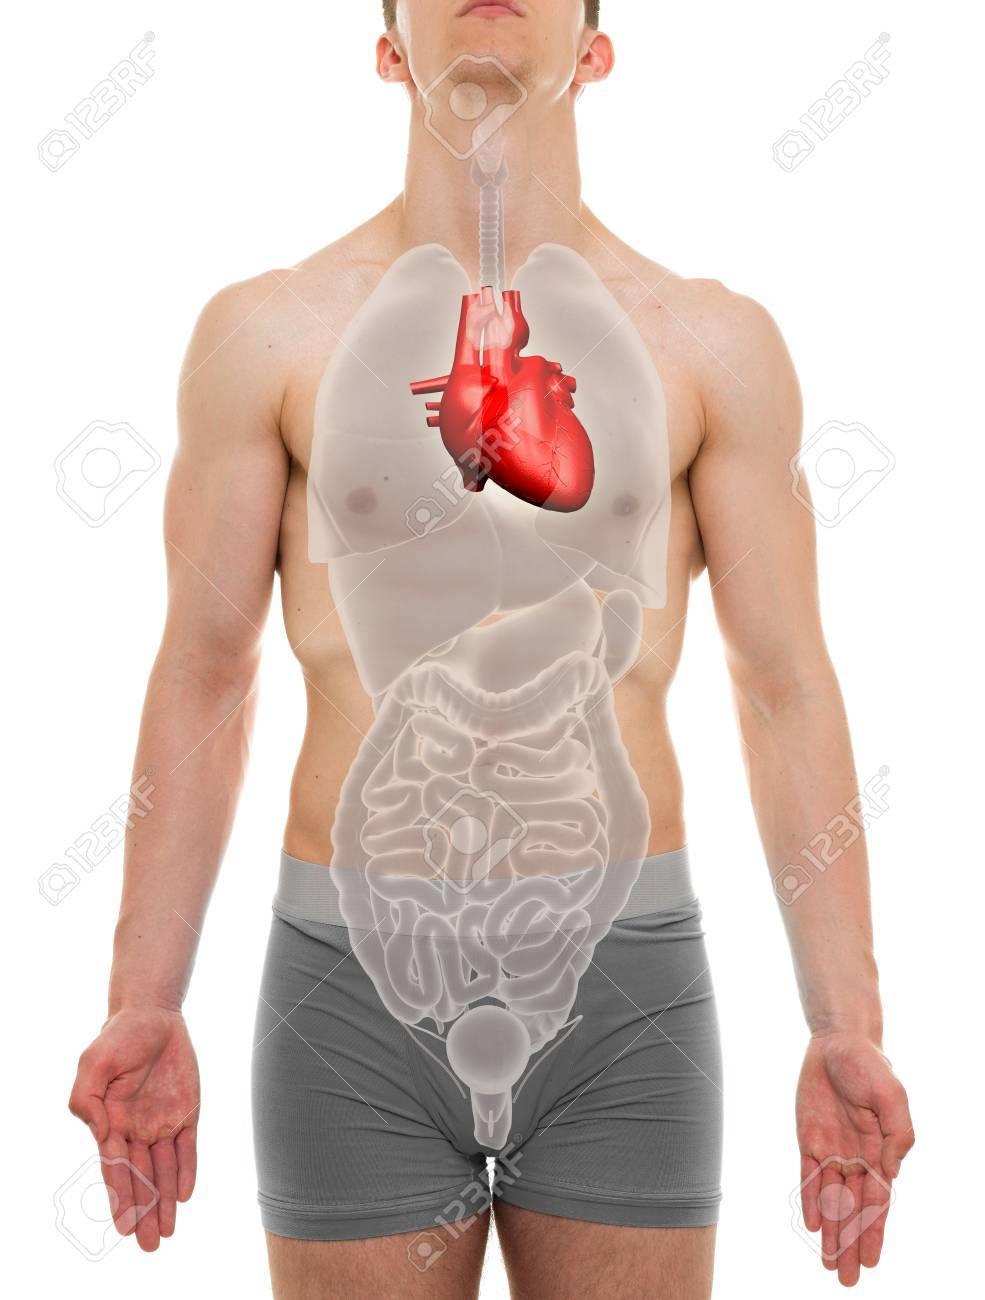 Heart Male - Internal Organs Anatomy - 3D Illustration Stock Photo ...